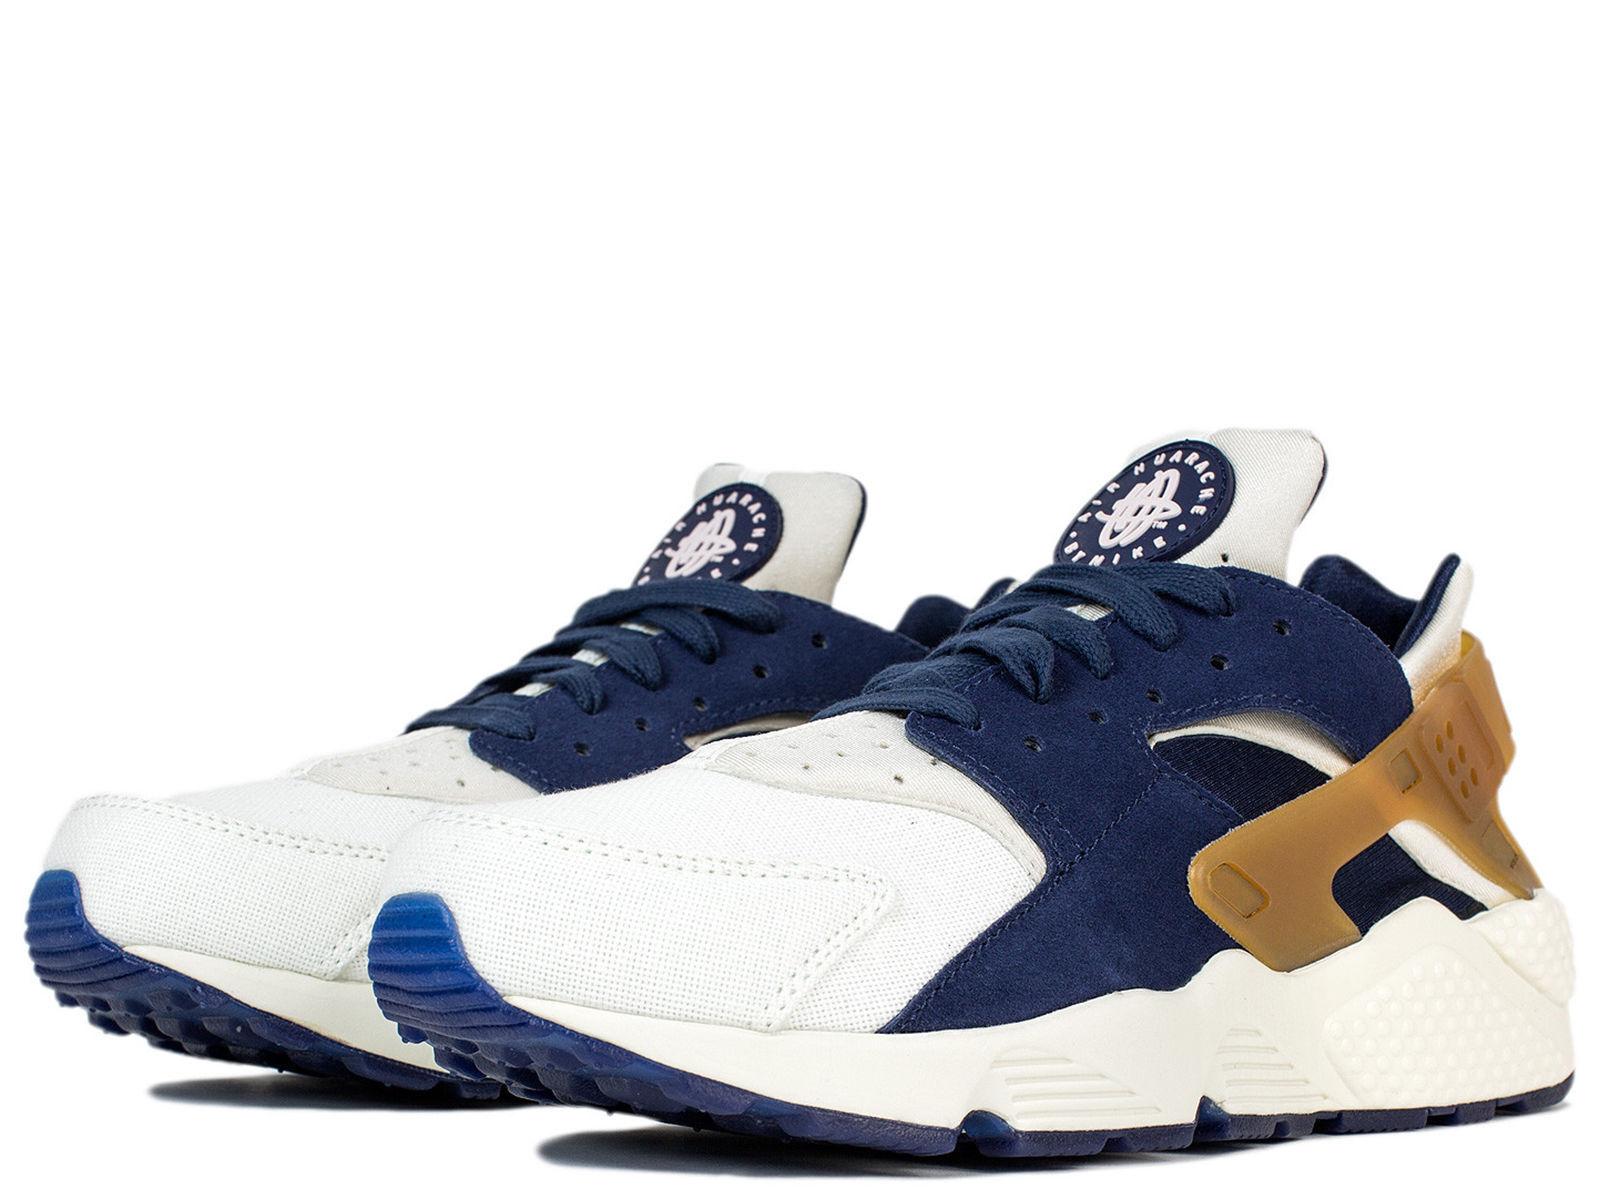 44ad6e5576d Nike Air Huarache Run Premium Silver Royal Black Olive 683818-007 Men shoes  9.5